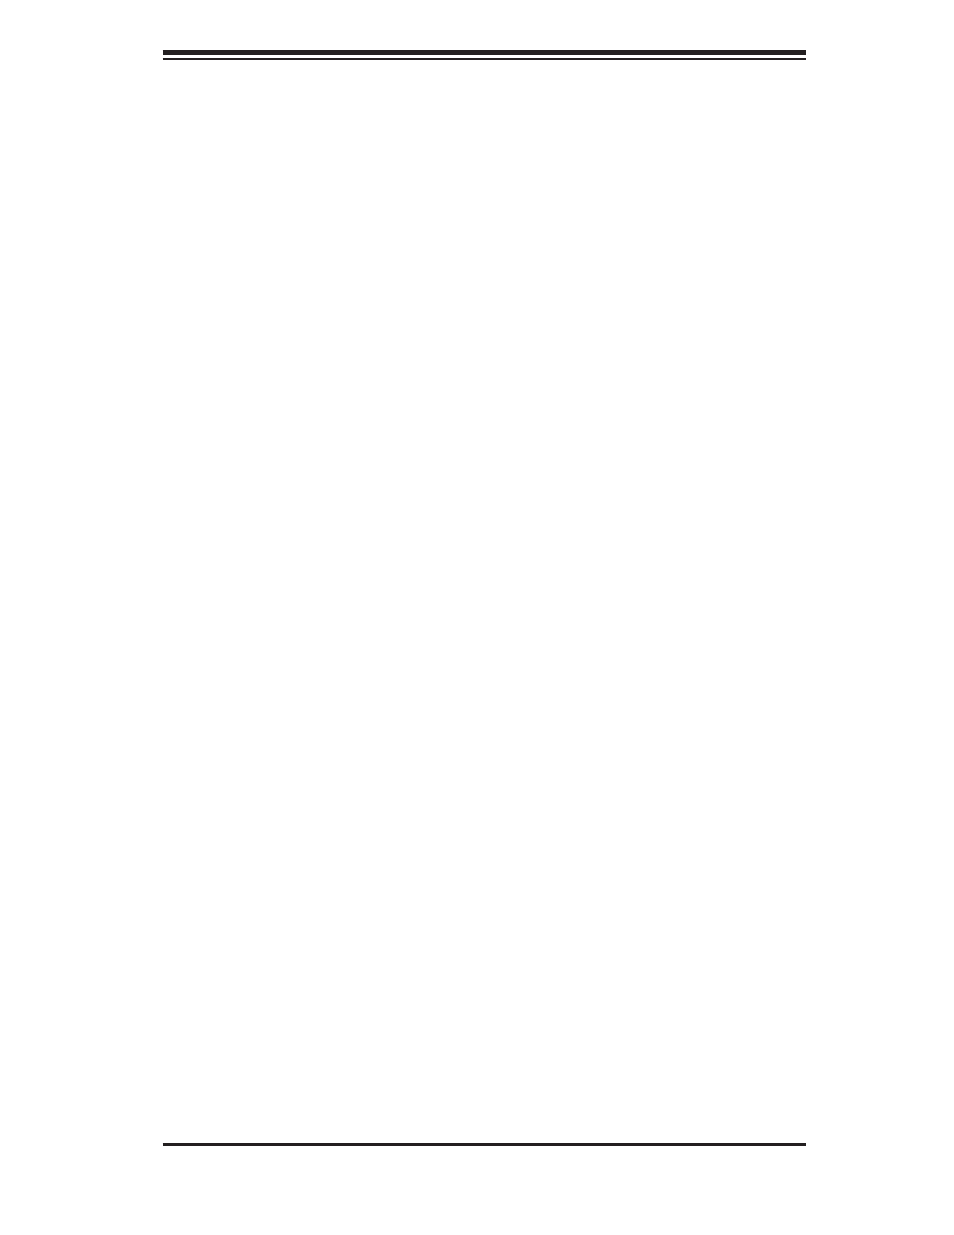 Appendix a bios error beep codes, A-1 amibios error beep